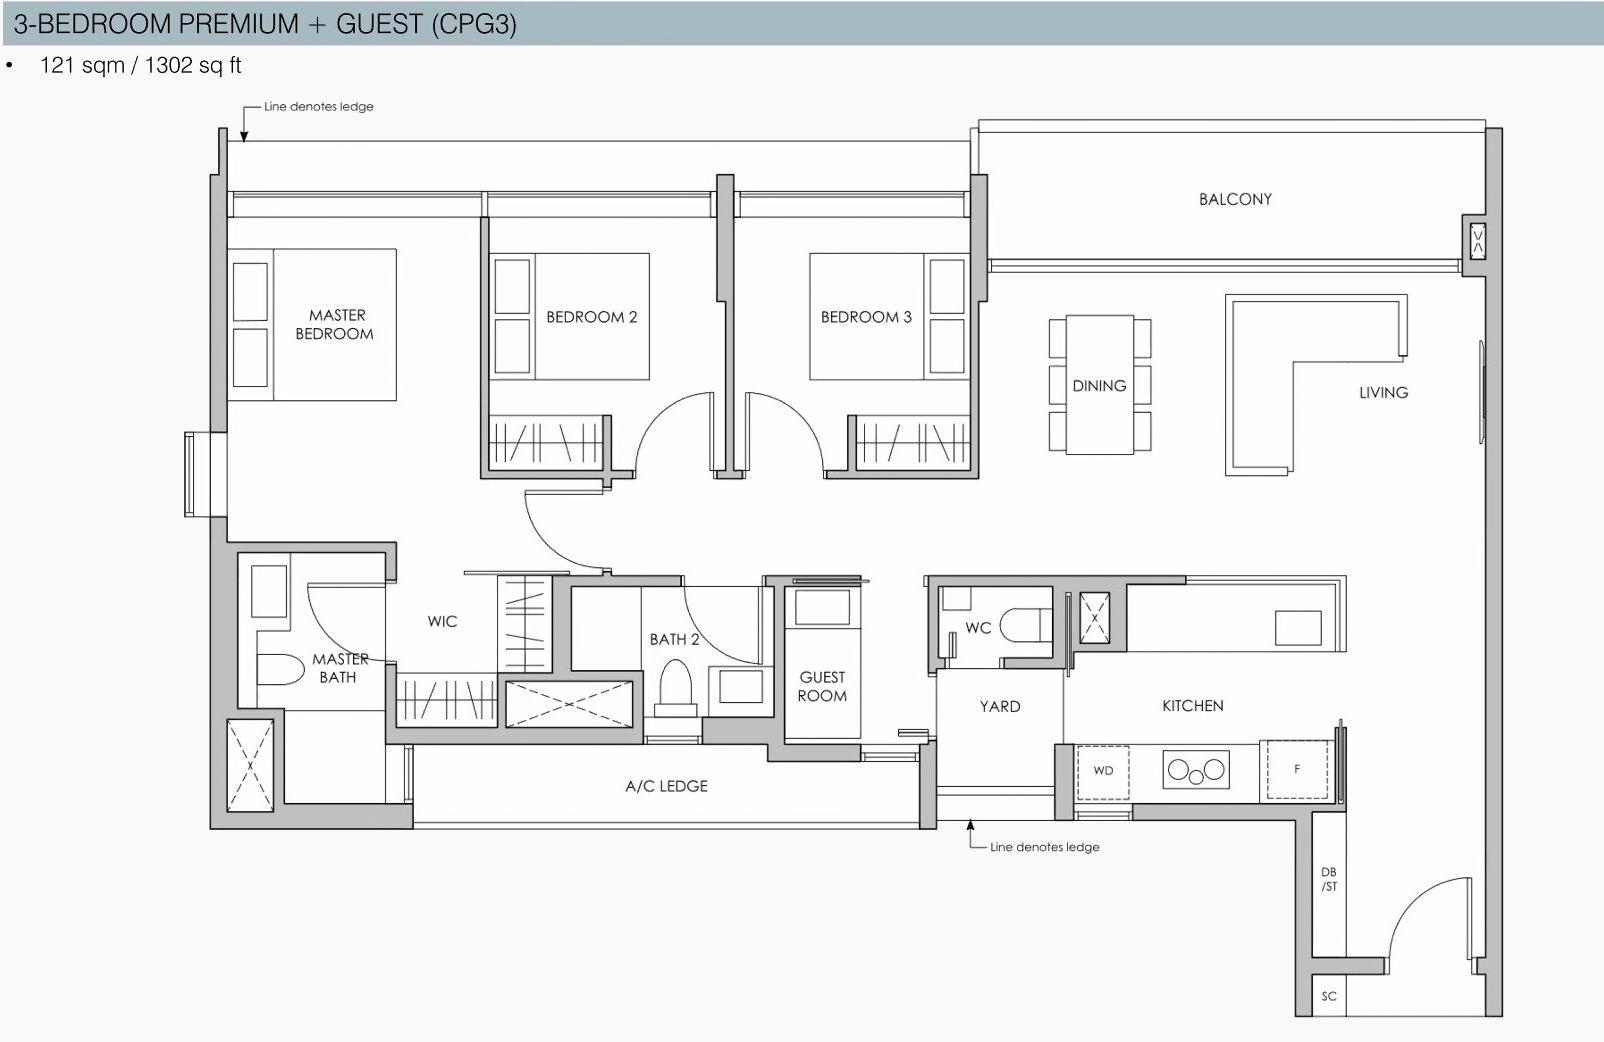 Pasir Ris 8 Floor Plans . 3 Bedroom Premium Guest Showflat Layout